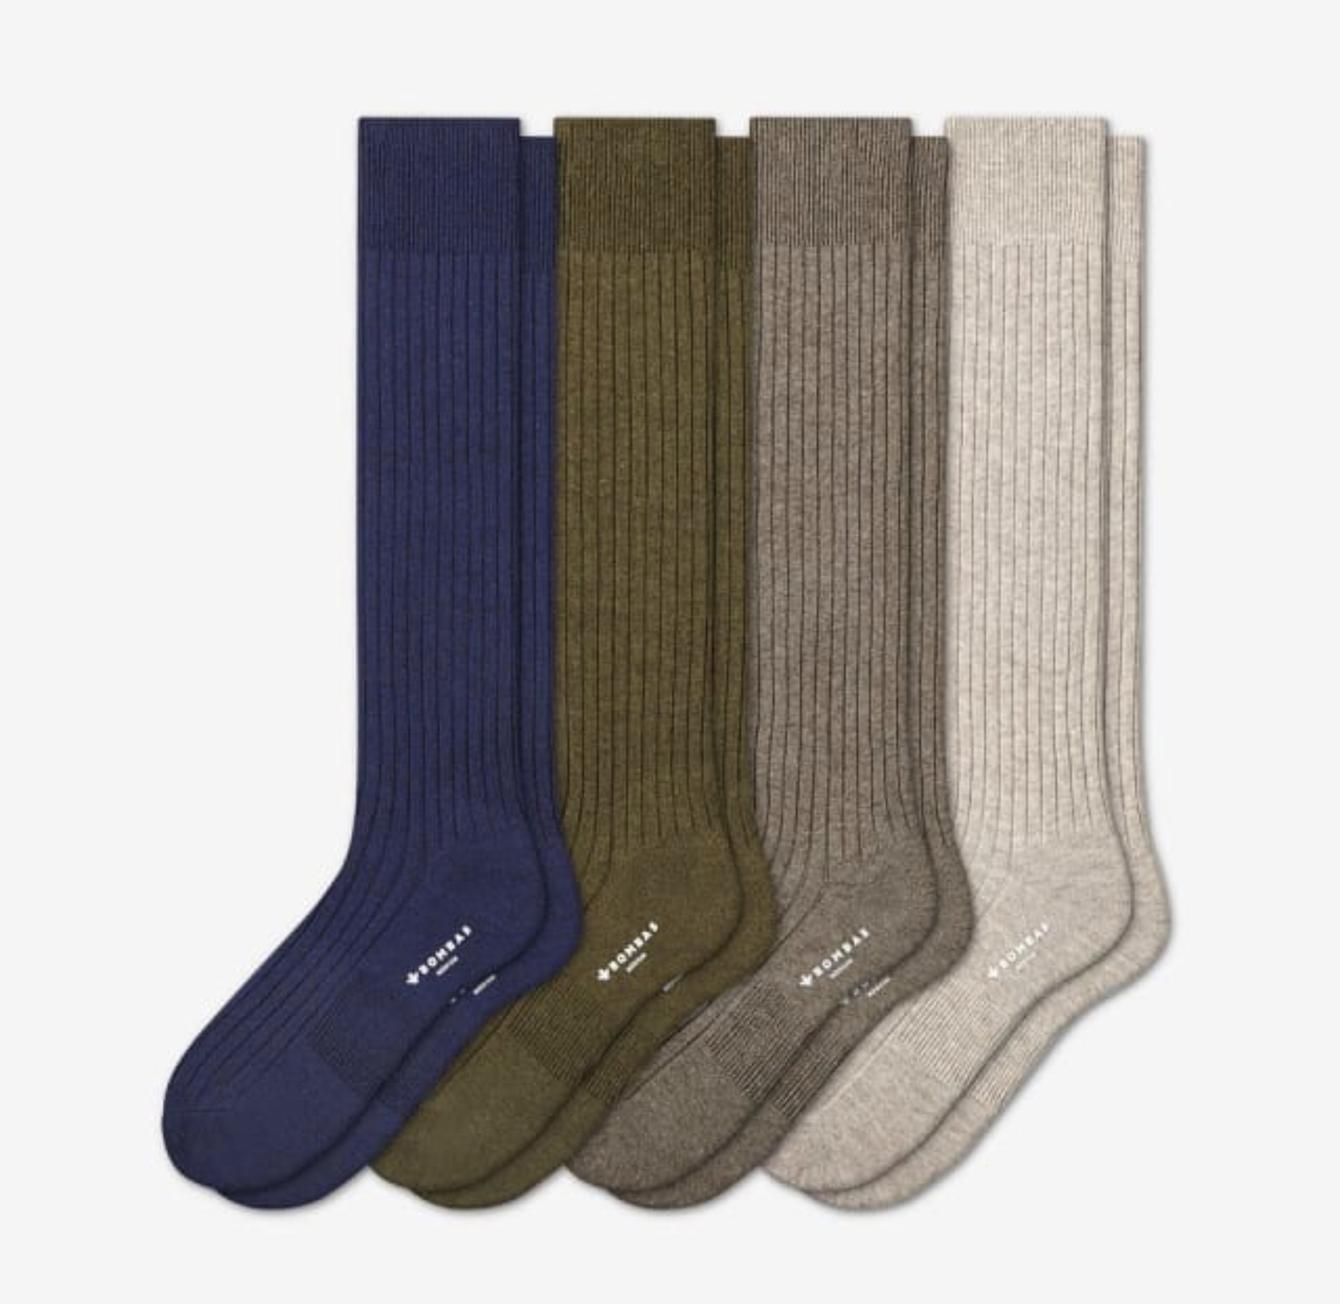 Bombas dress socks